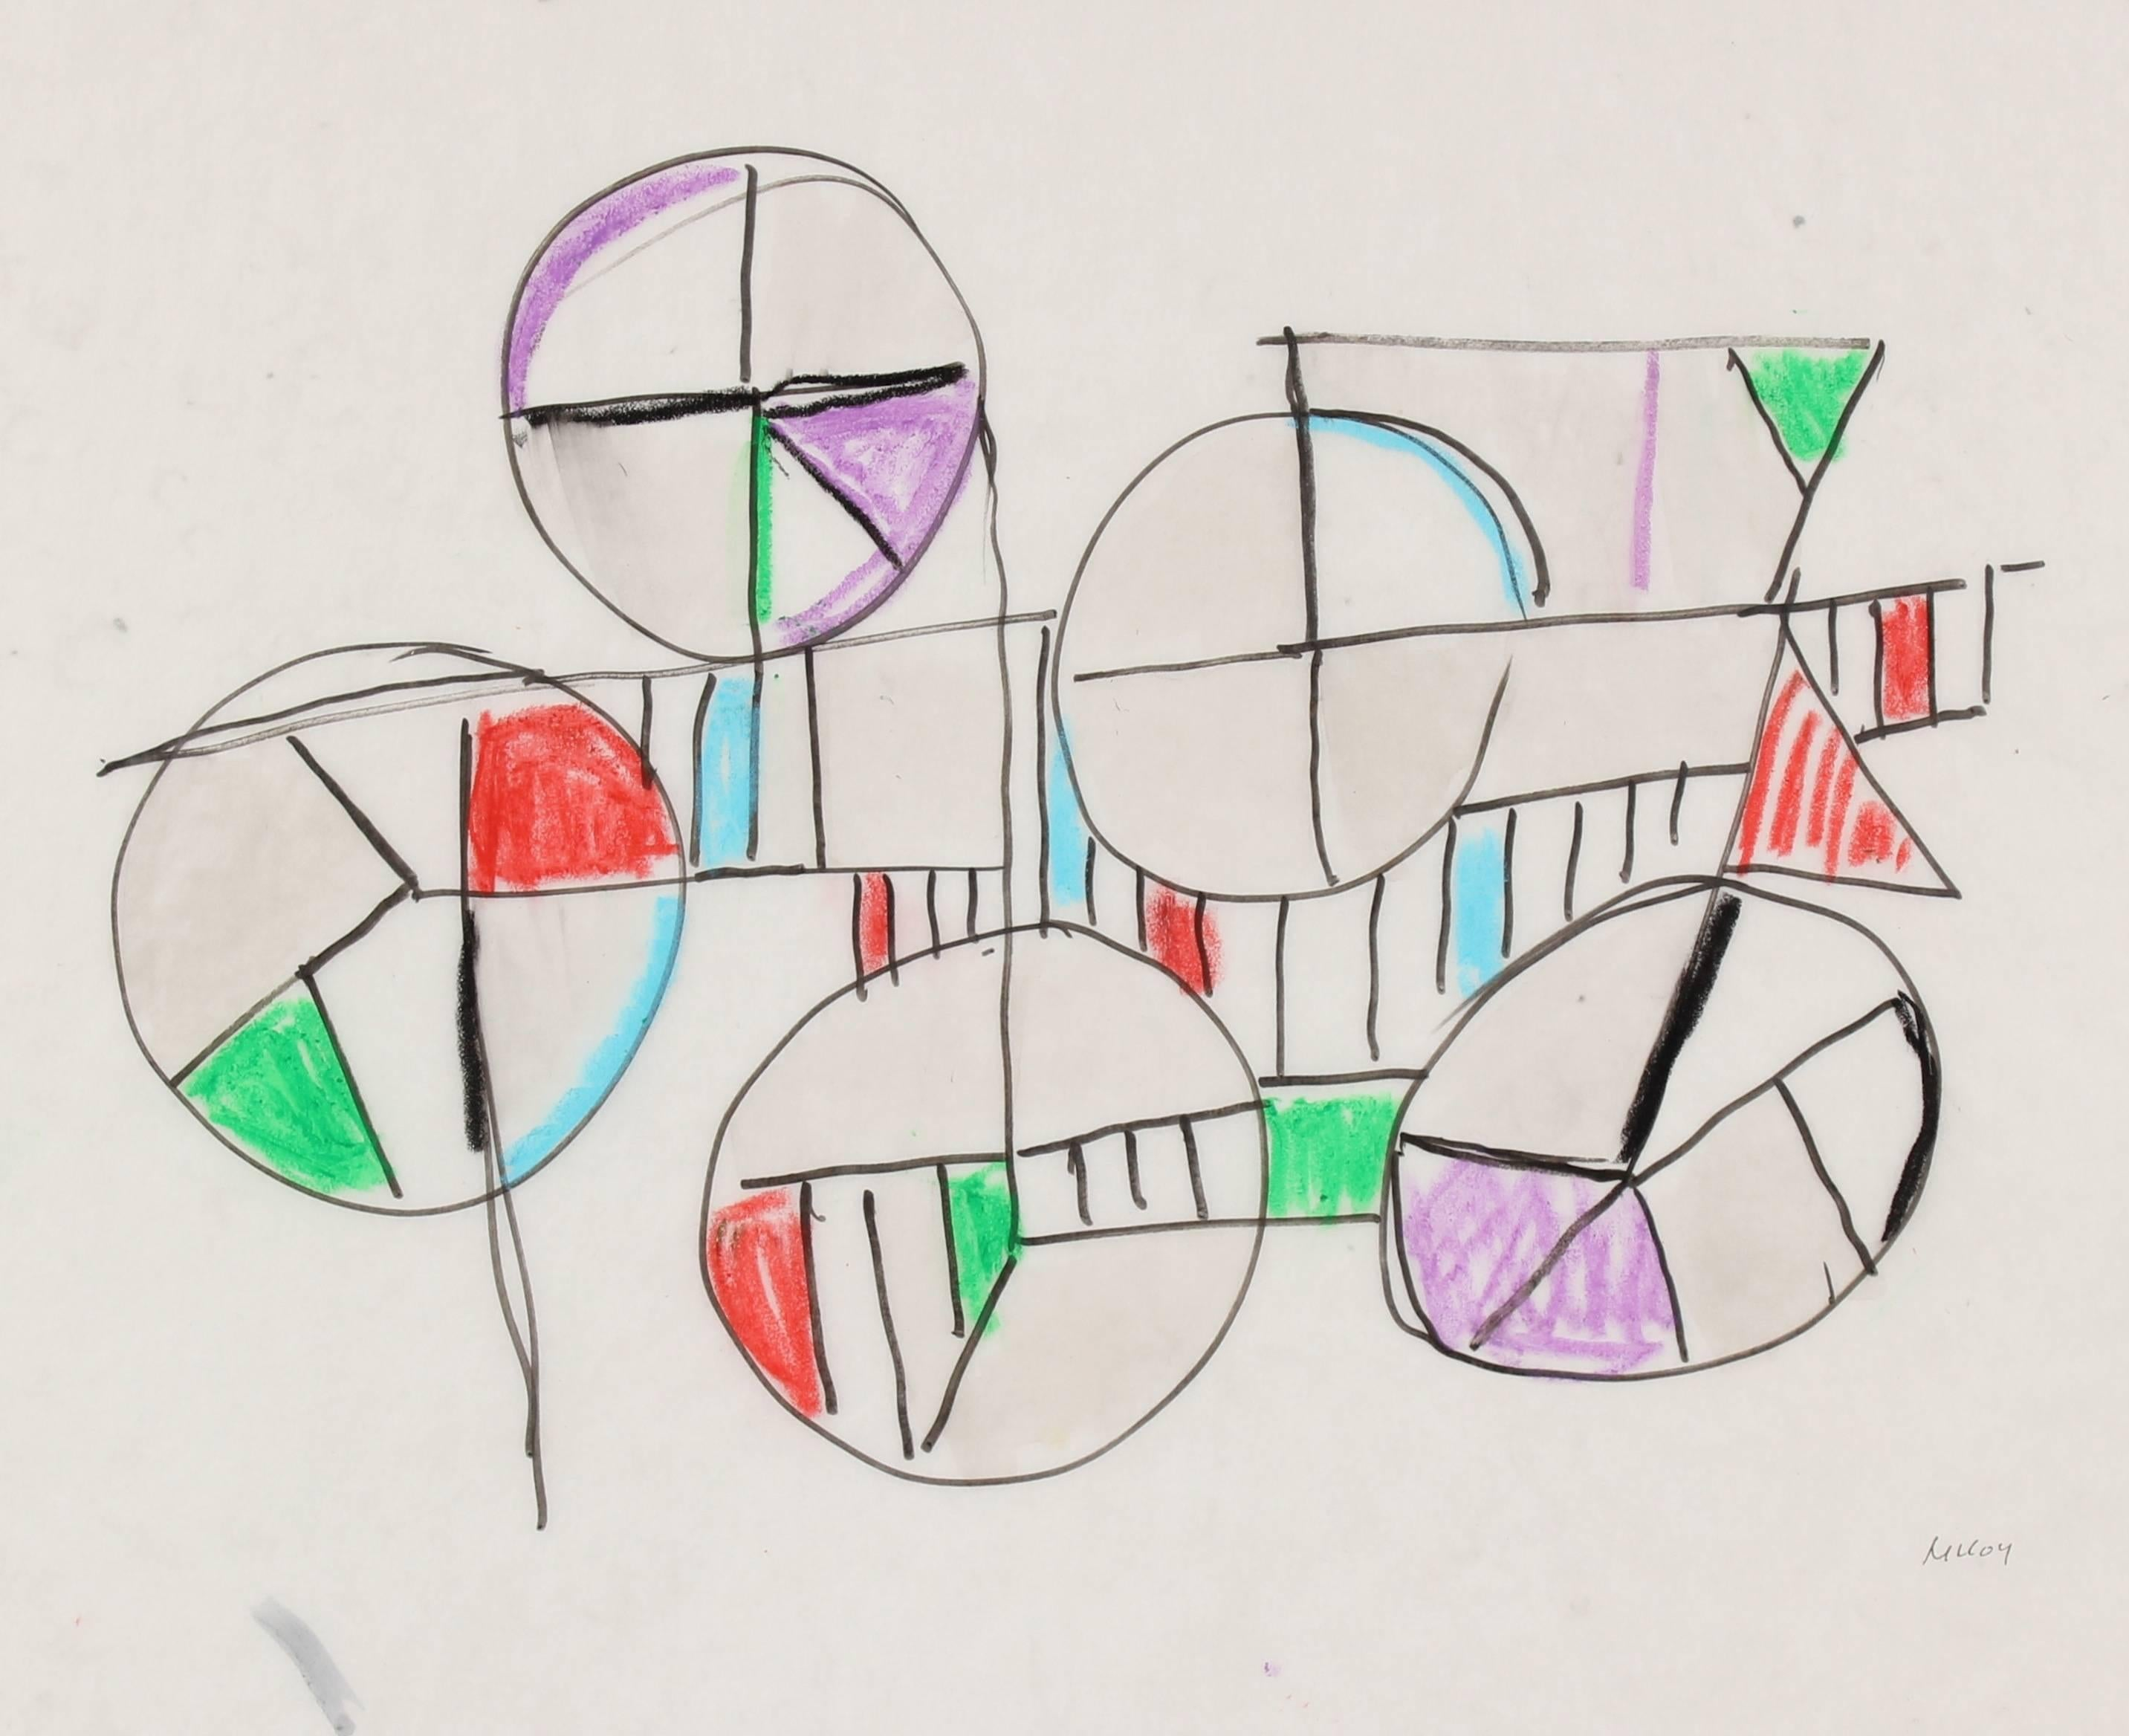 Circular Abstract in Oil Pastel, Circa 1960s